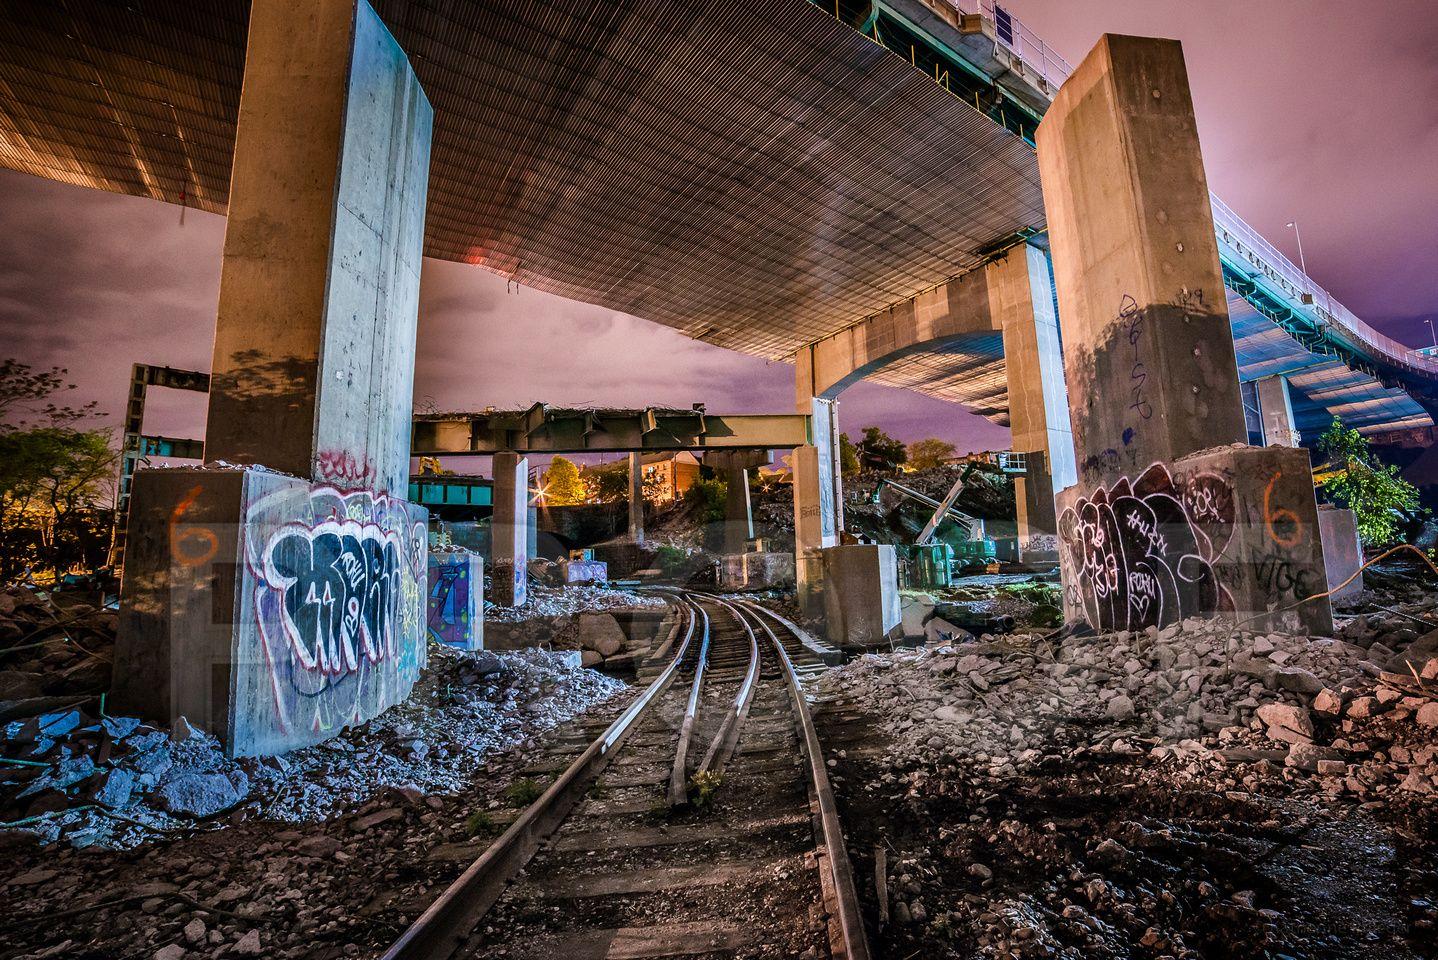 Graffiti ruins by train tracks fall river massachusetts